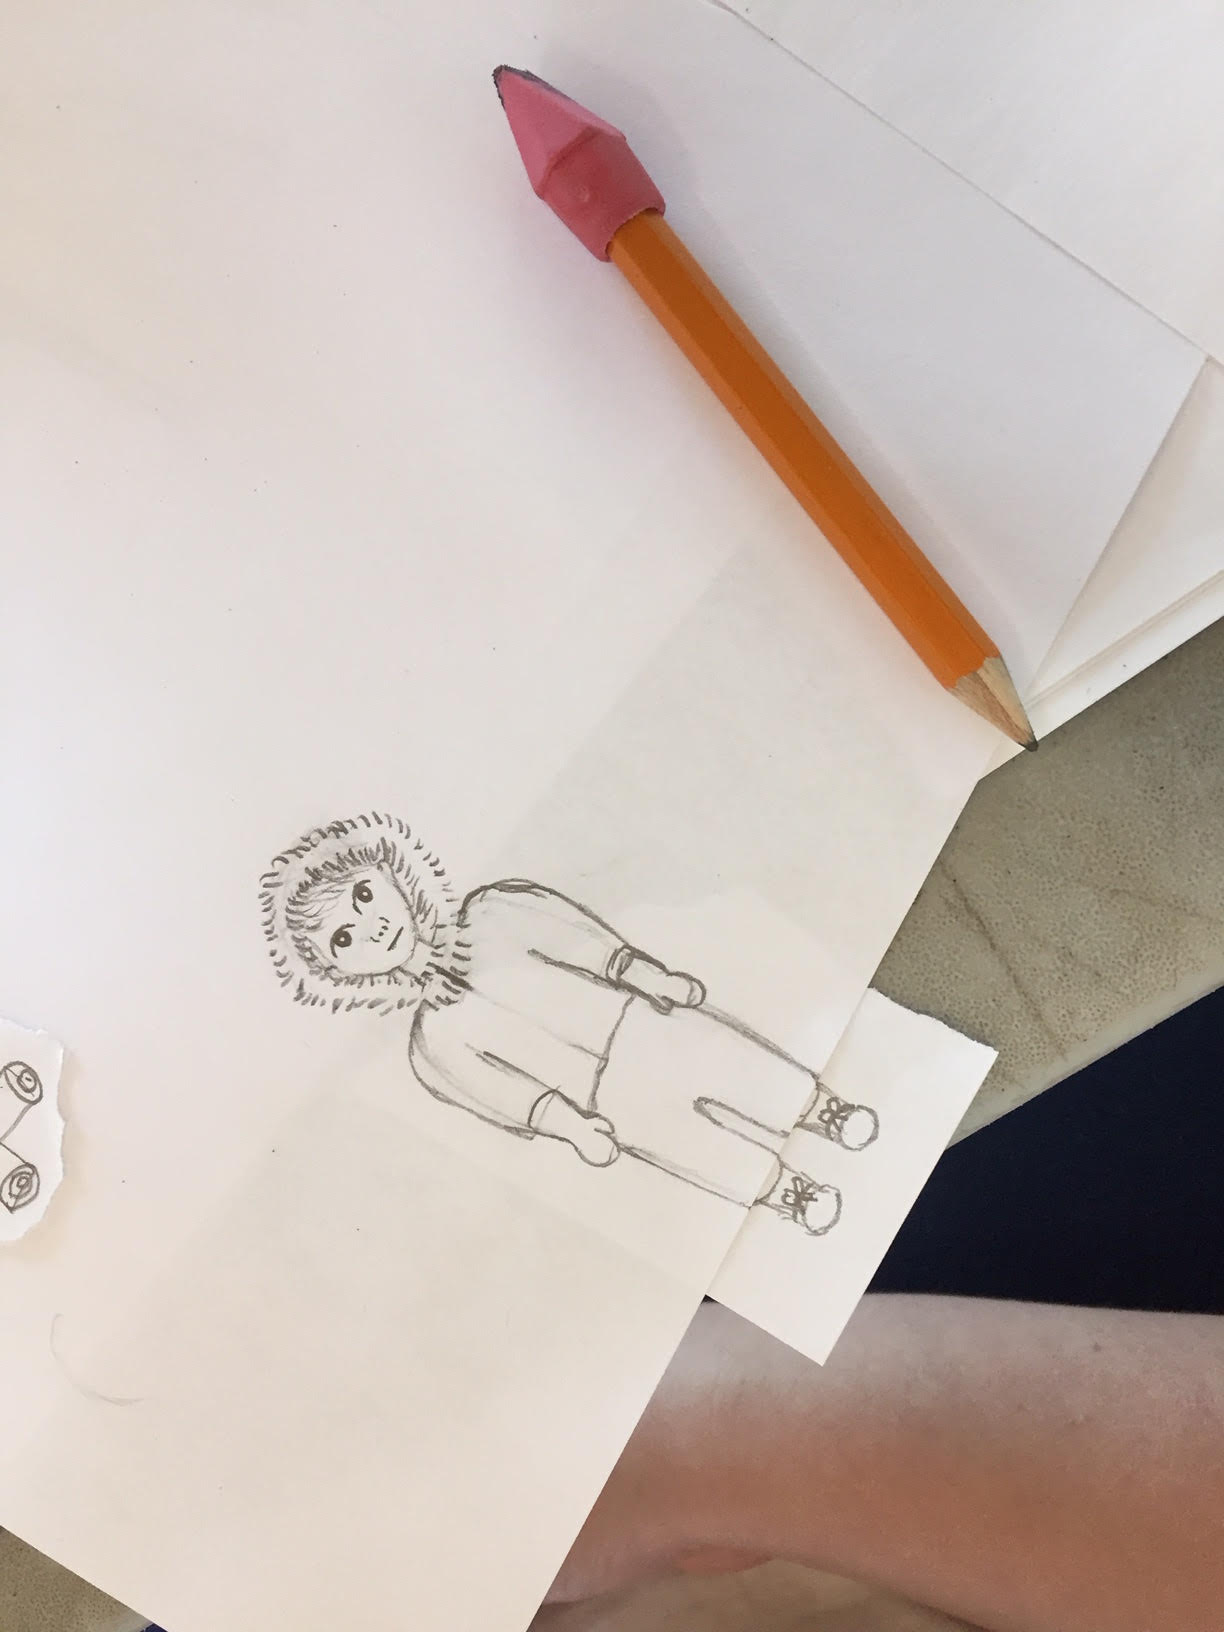 Ciara is an artist - FOR SURE